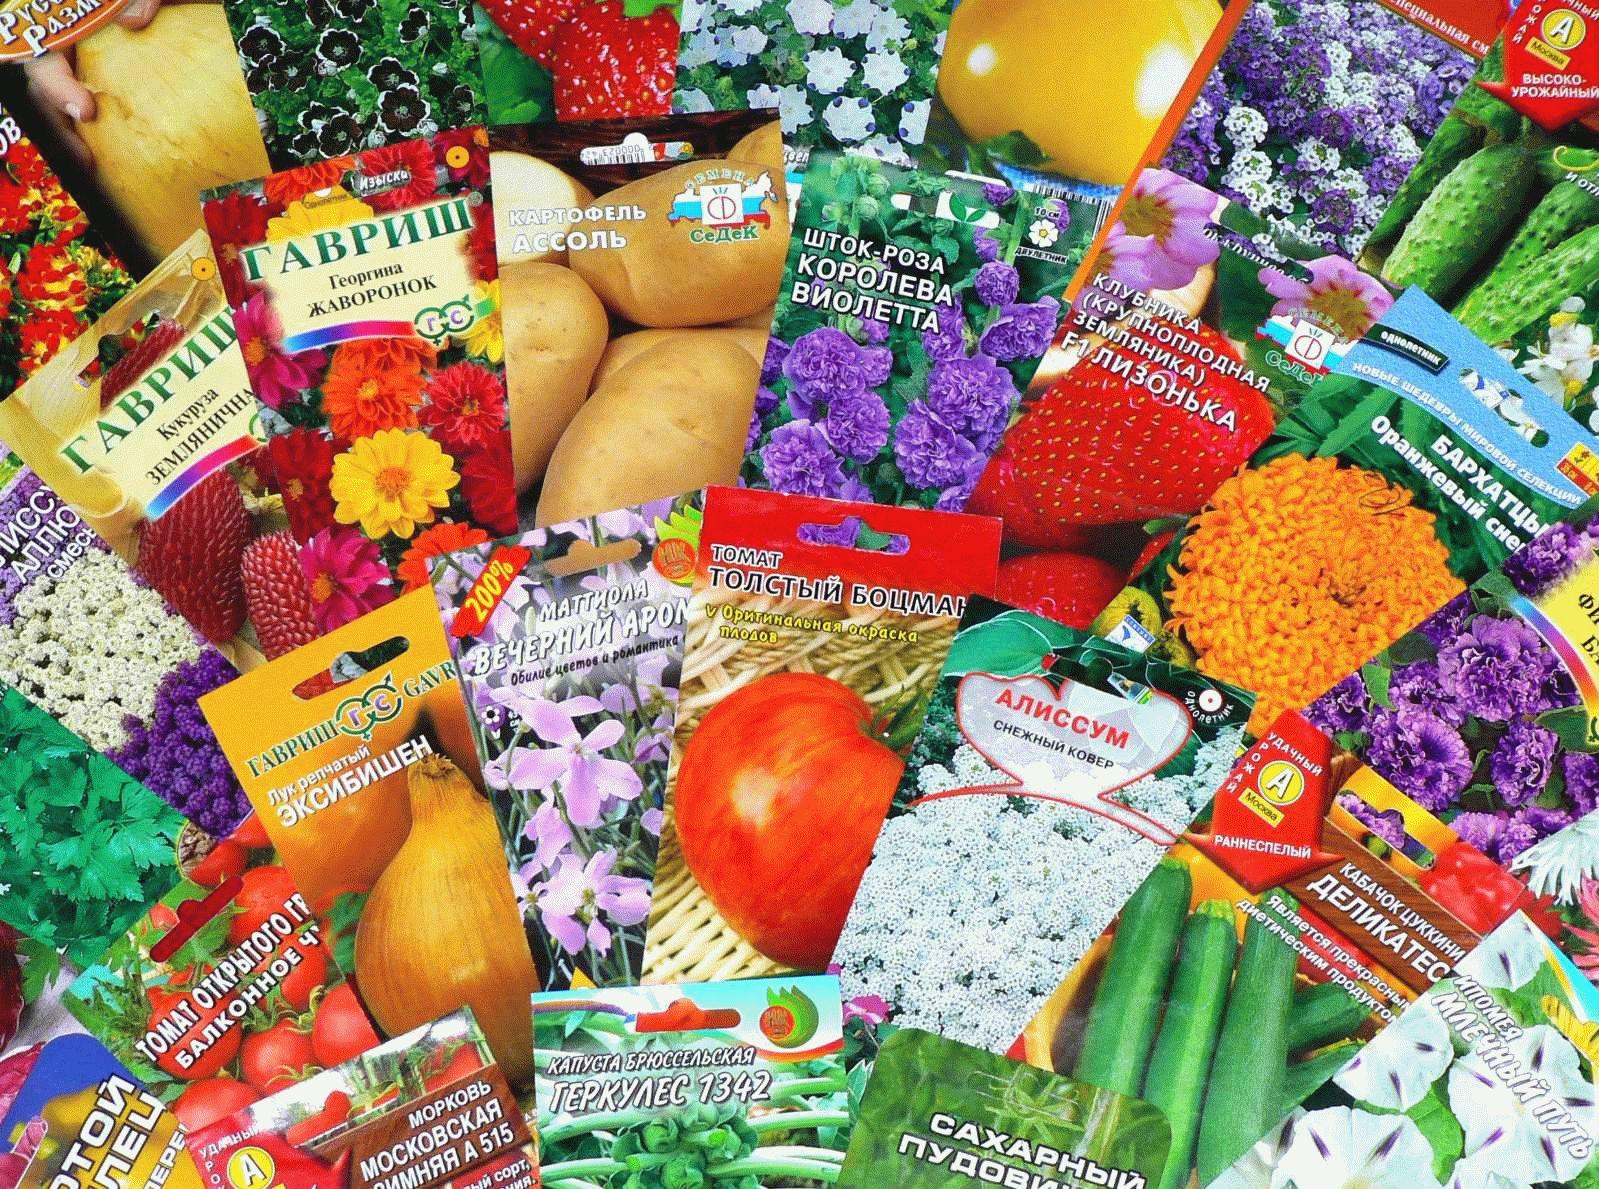 Продажа семян и рассады 225